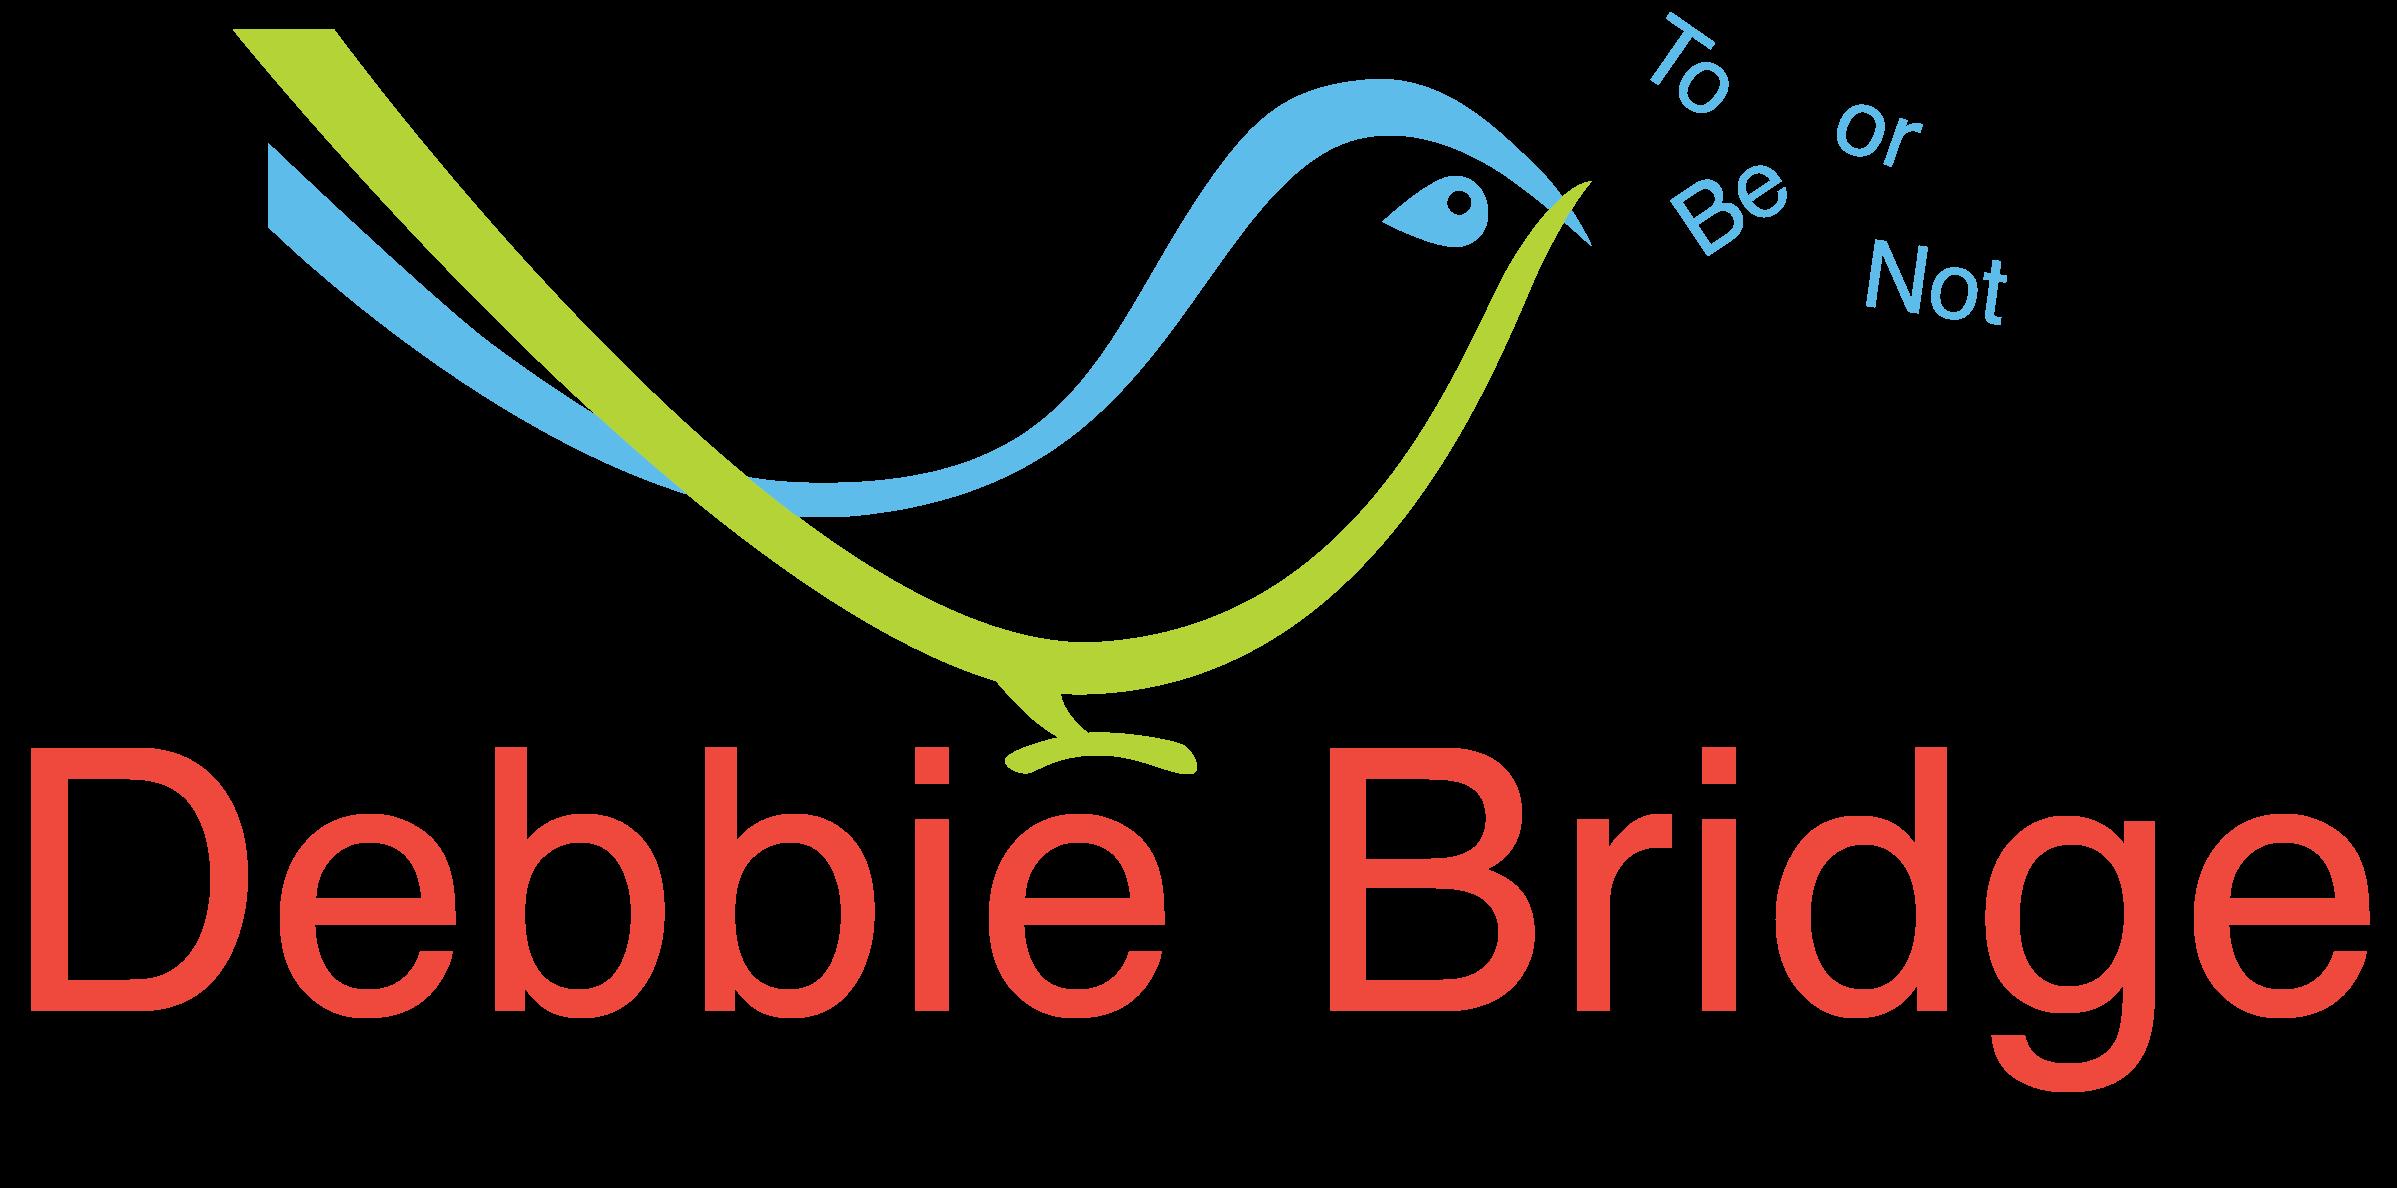 Debbie Bridge – Acting